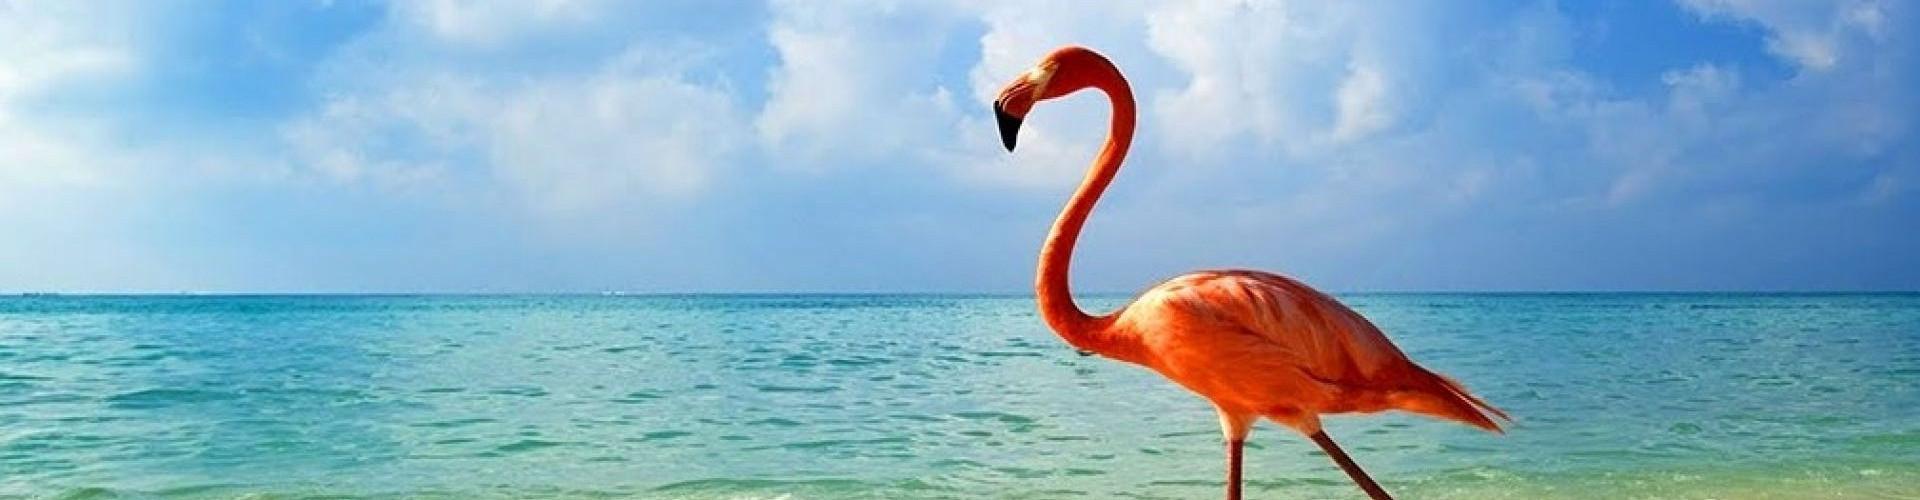 1 - Flamingo